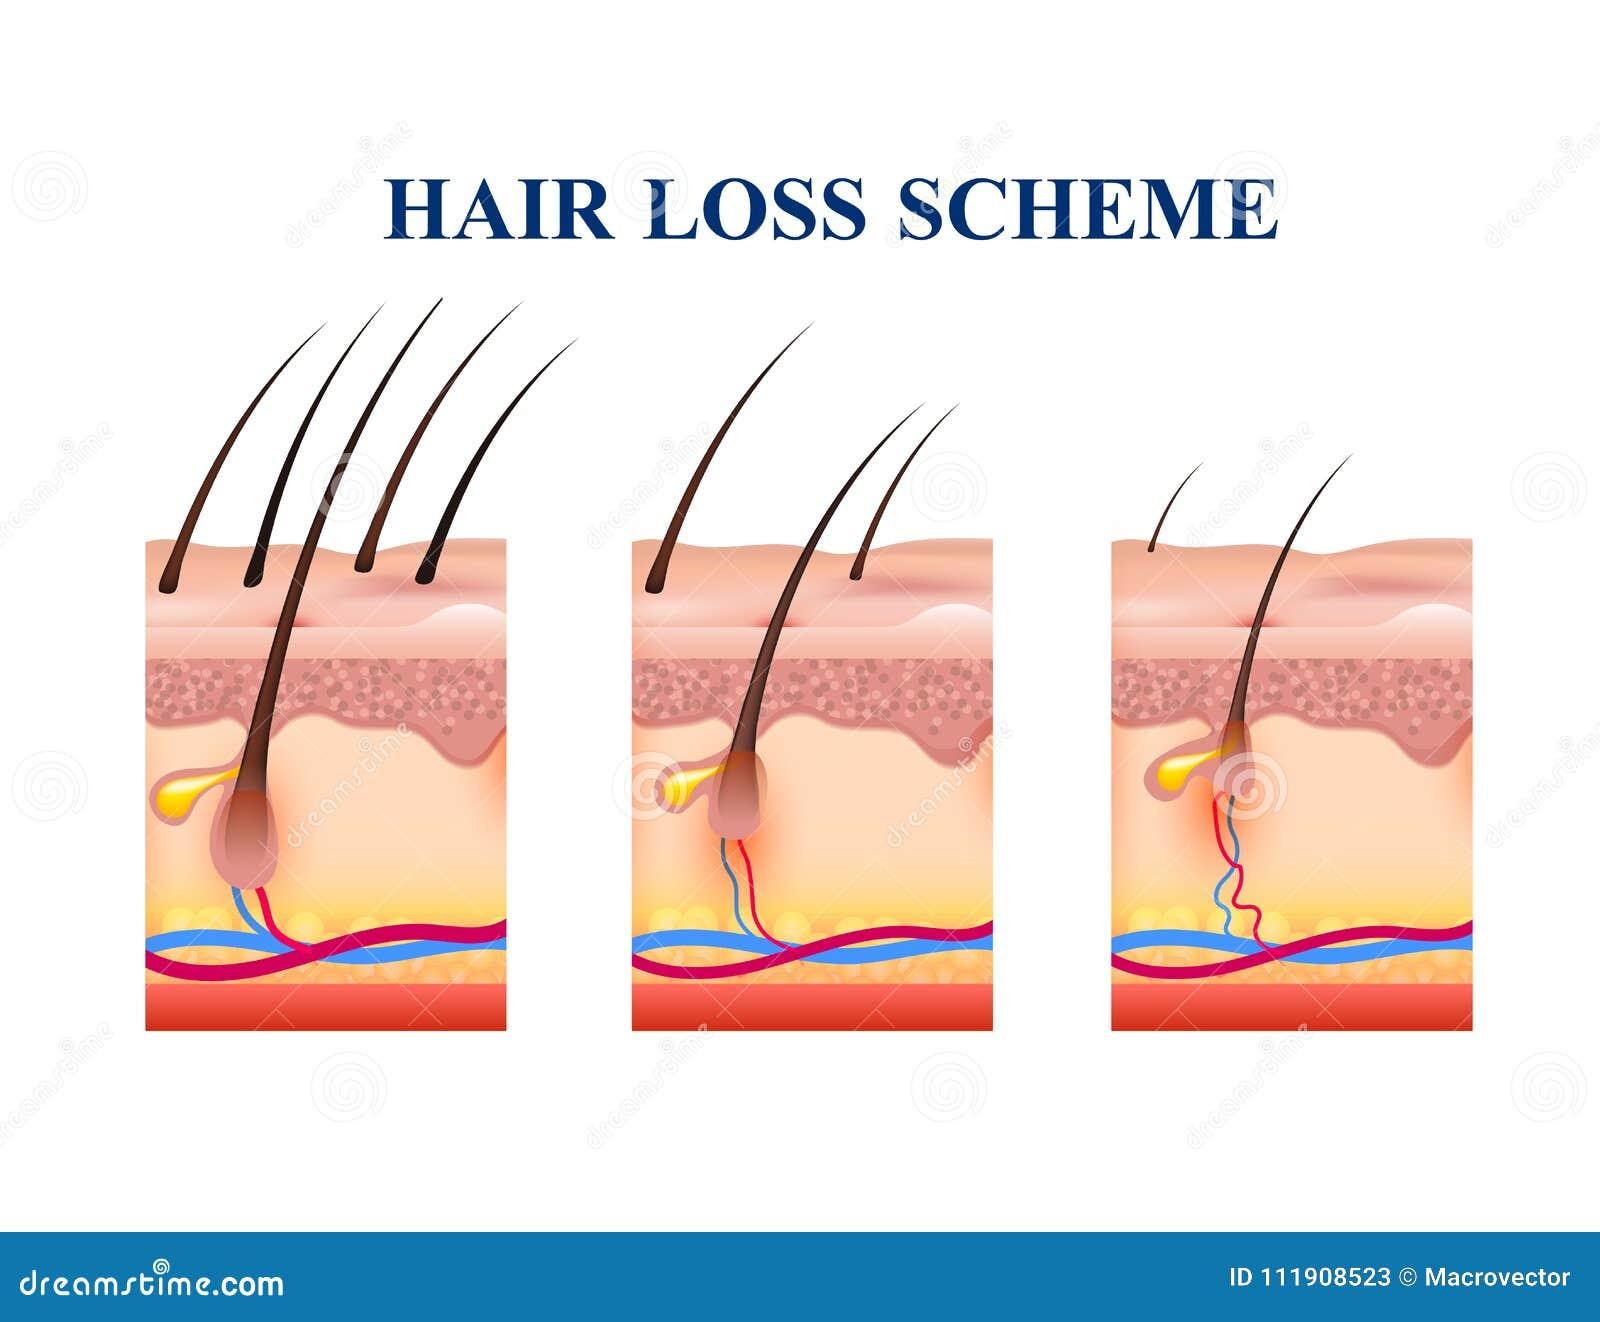 alopecia skin diagram hair loss scheme stock vector. illustration of healthy ... #10